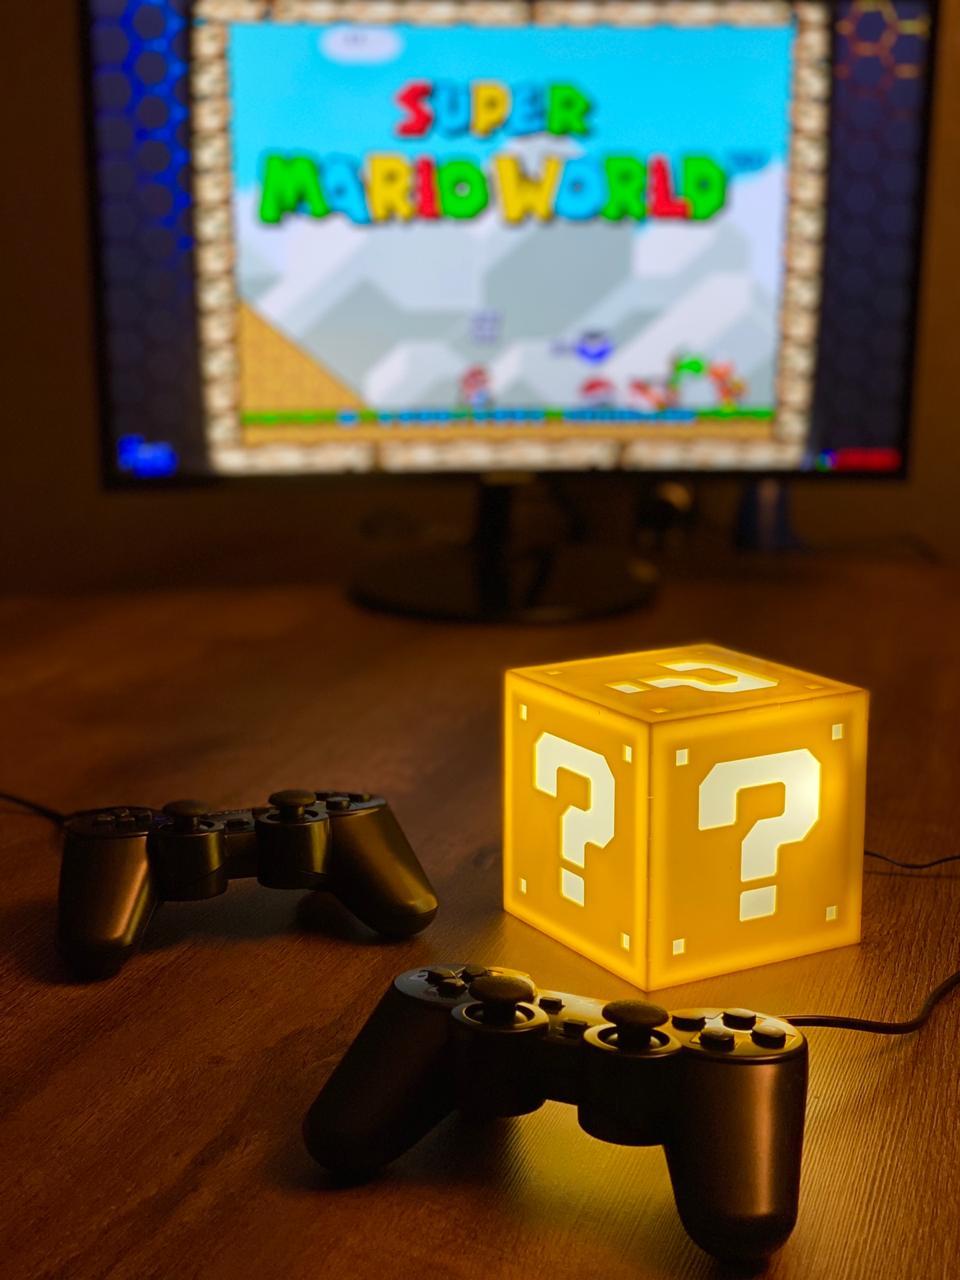 Cubo Retrô Box Interrogação Mario: Fliperama Arcade Game (20.000 Jogos) PlayStation/Nintendo/SNES/Mega Drive/Sega Saturn - EV